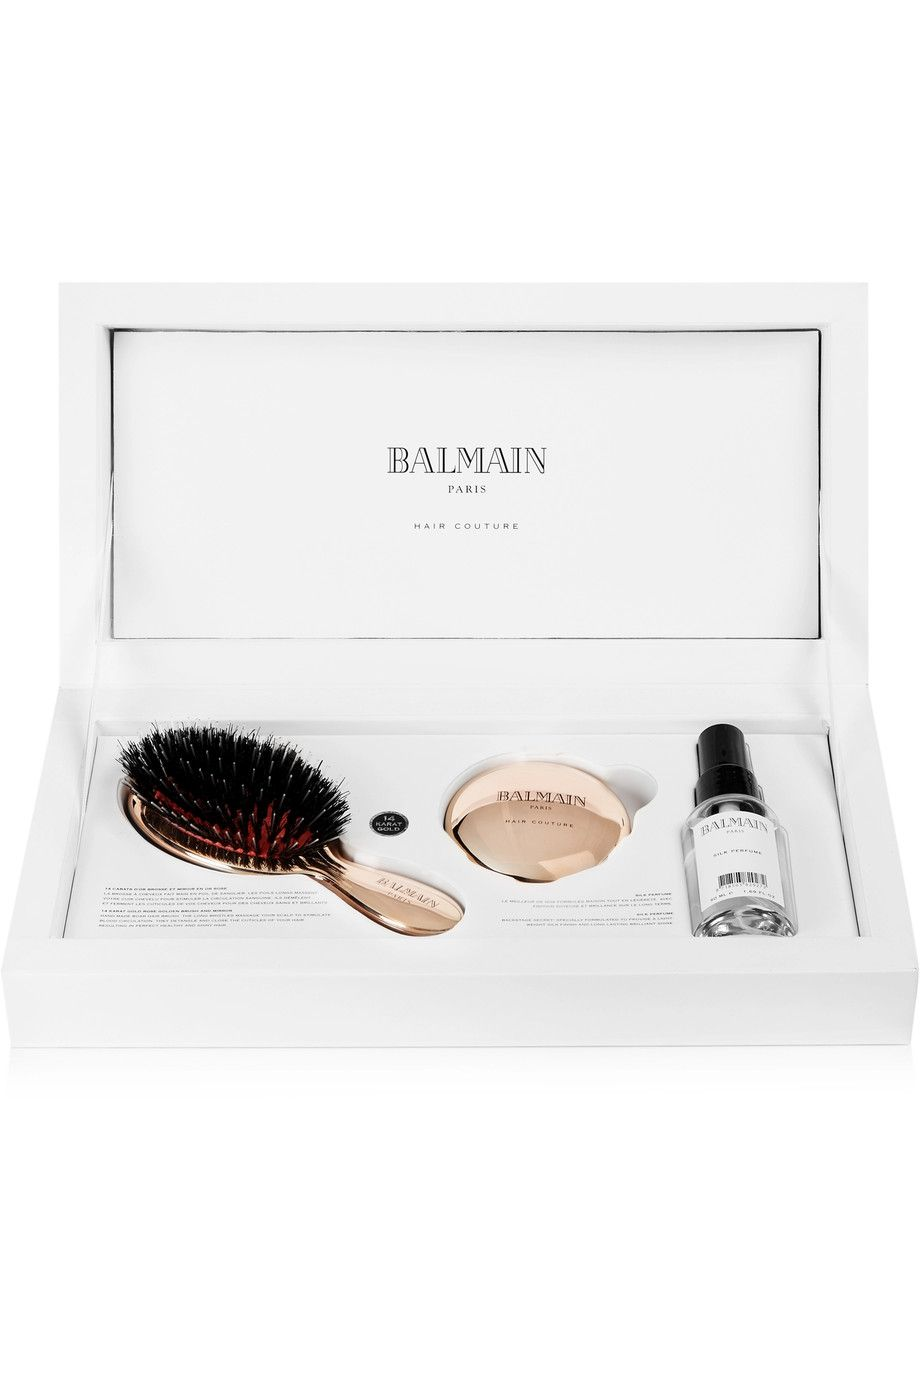 Dore Coffret Coiffure Parfum Miroir Et Mini Brosse Plaques Or Rose Balmain Paris Hair Couture Balmain Paris Balmain Huile D Argan